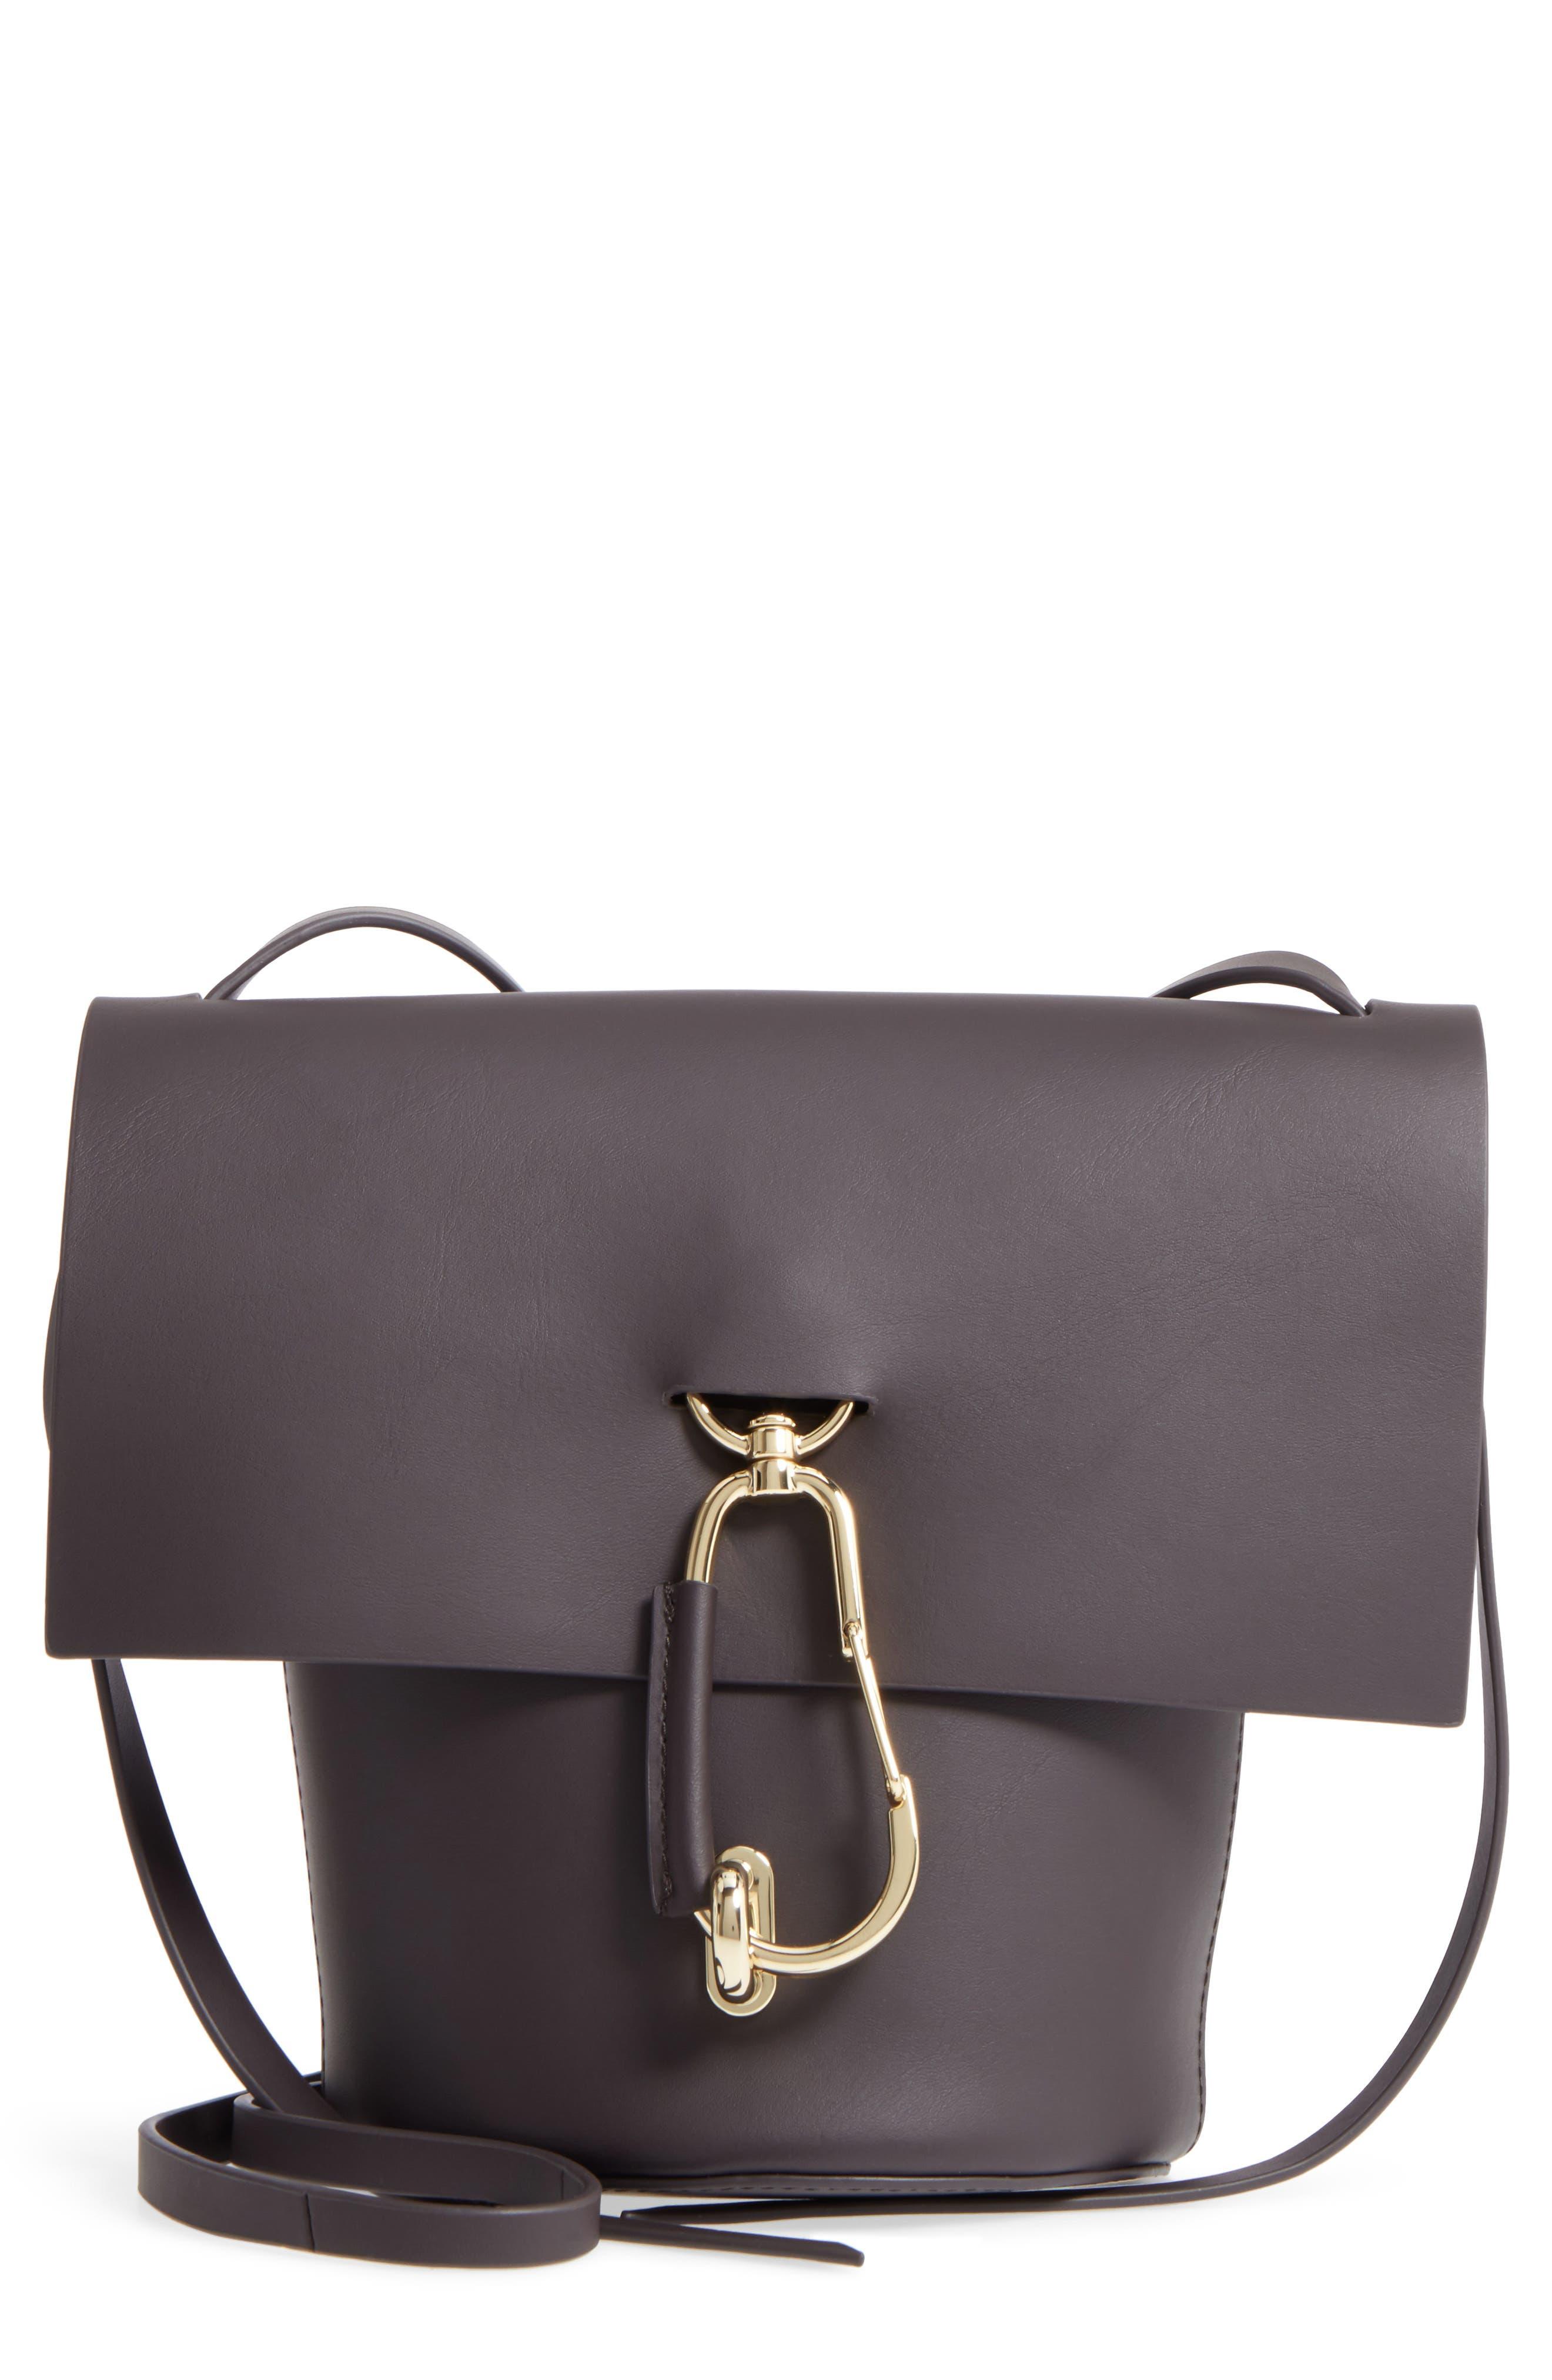 ZAC Zac Posen Belay Calfskin Leather Crossbody Bucket Bag